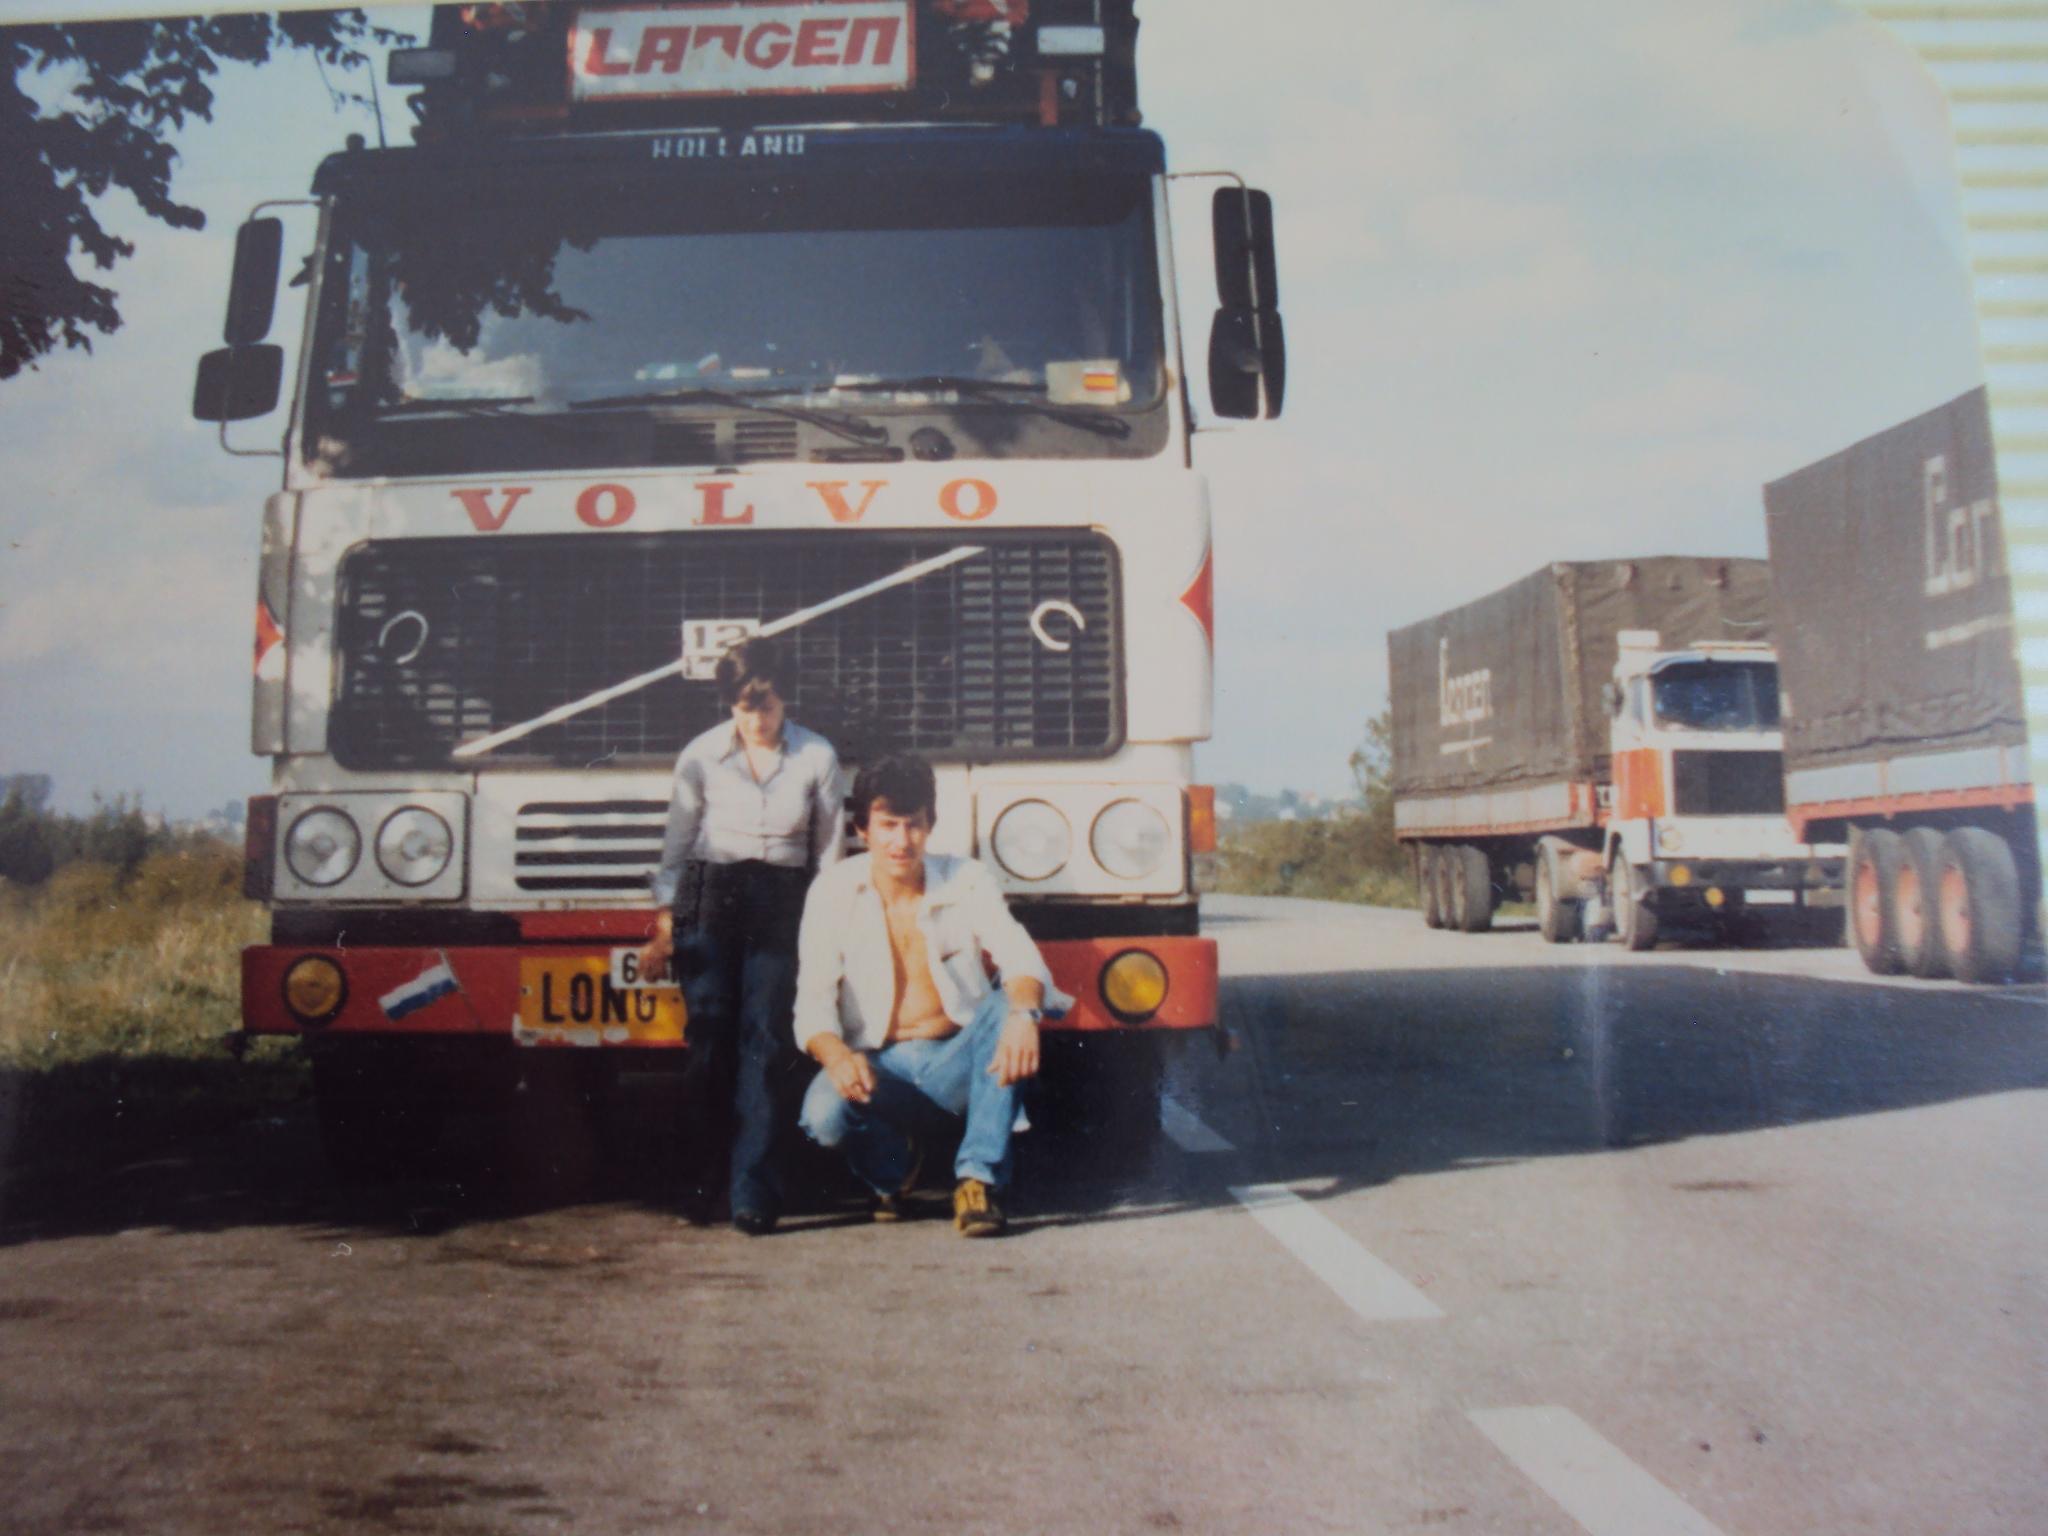 Abraham-Driver-Langen--28